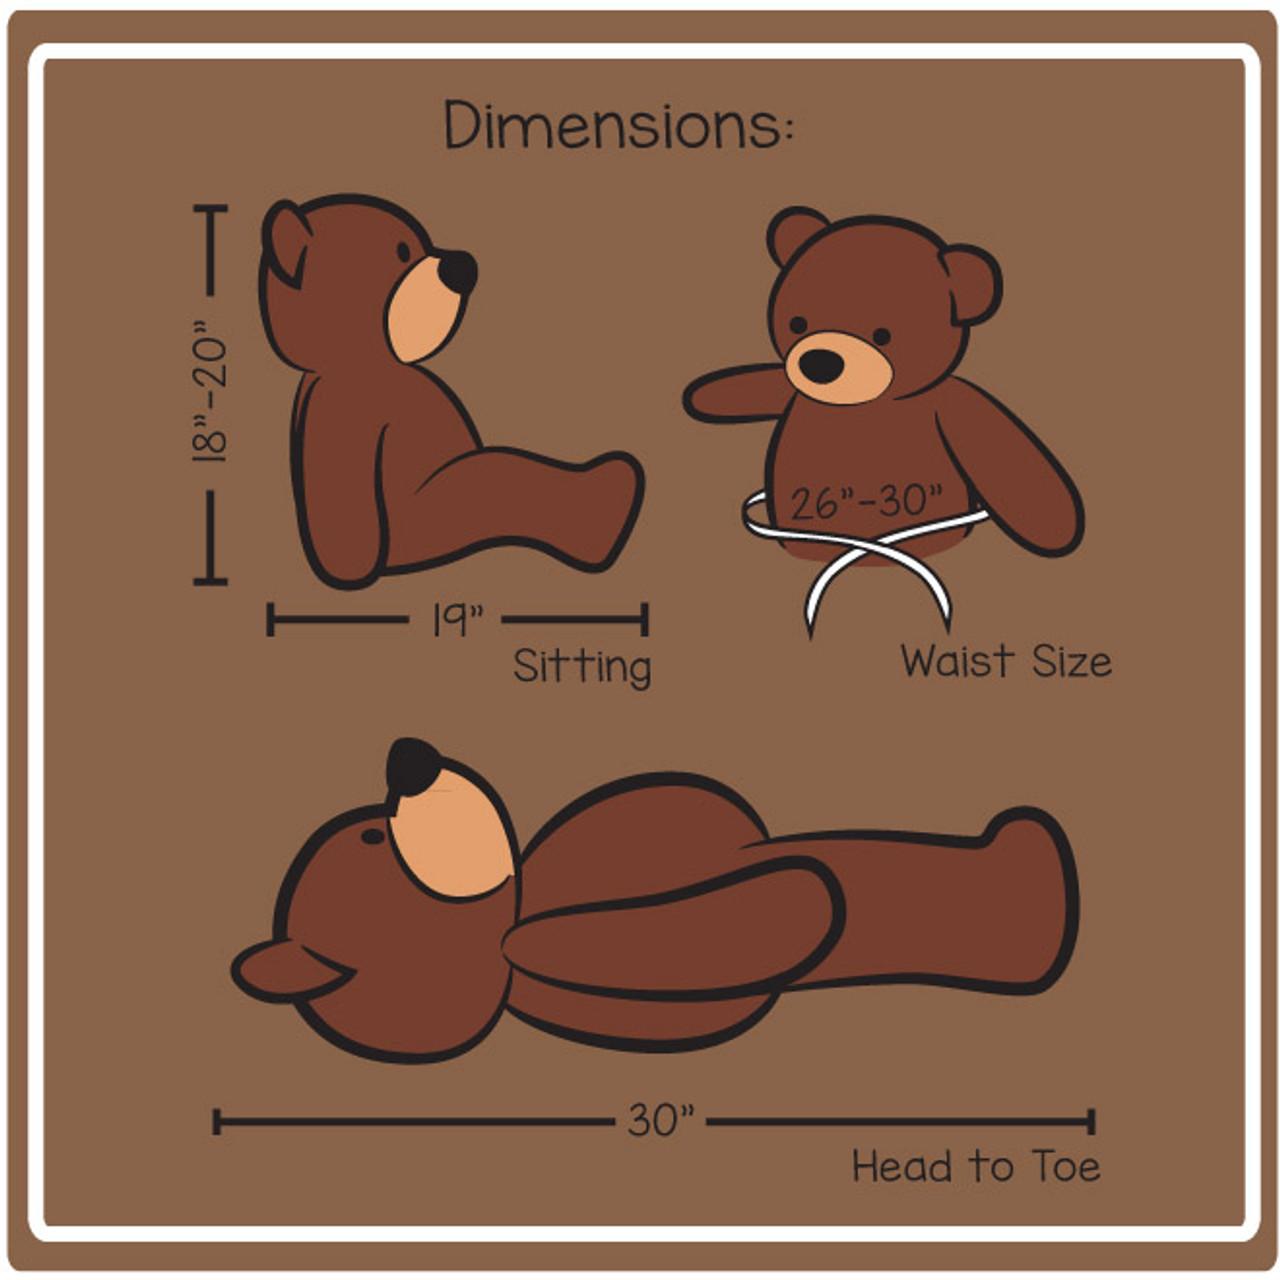 30in cuddles dimensions